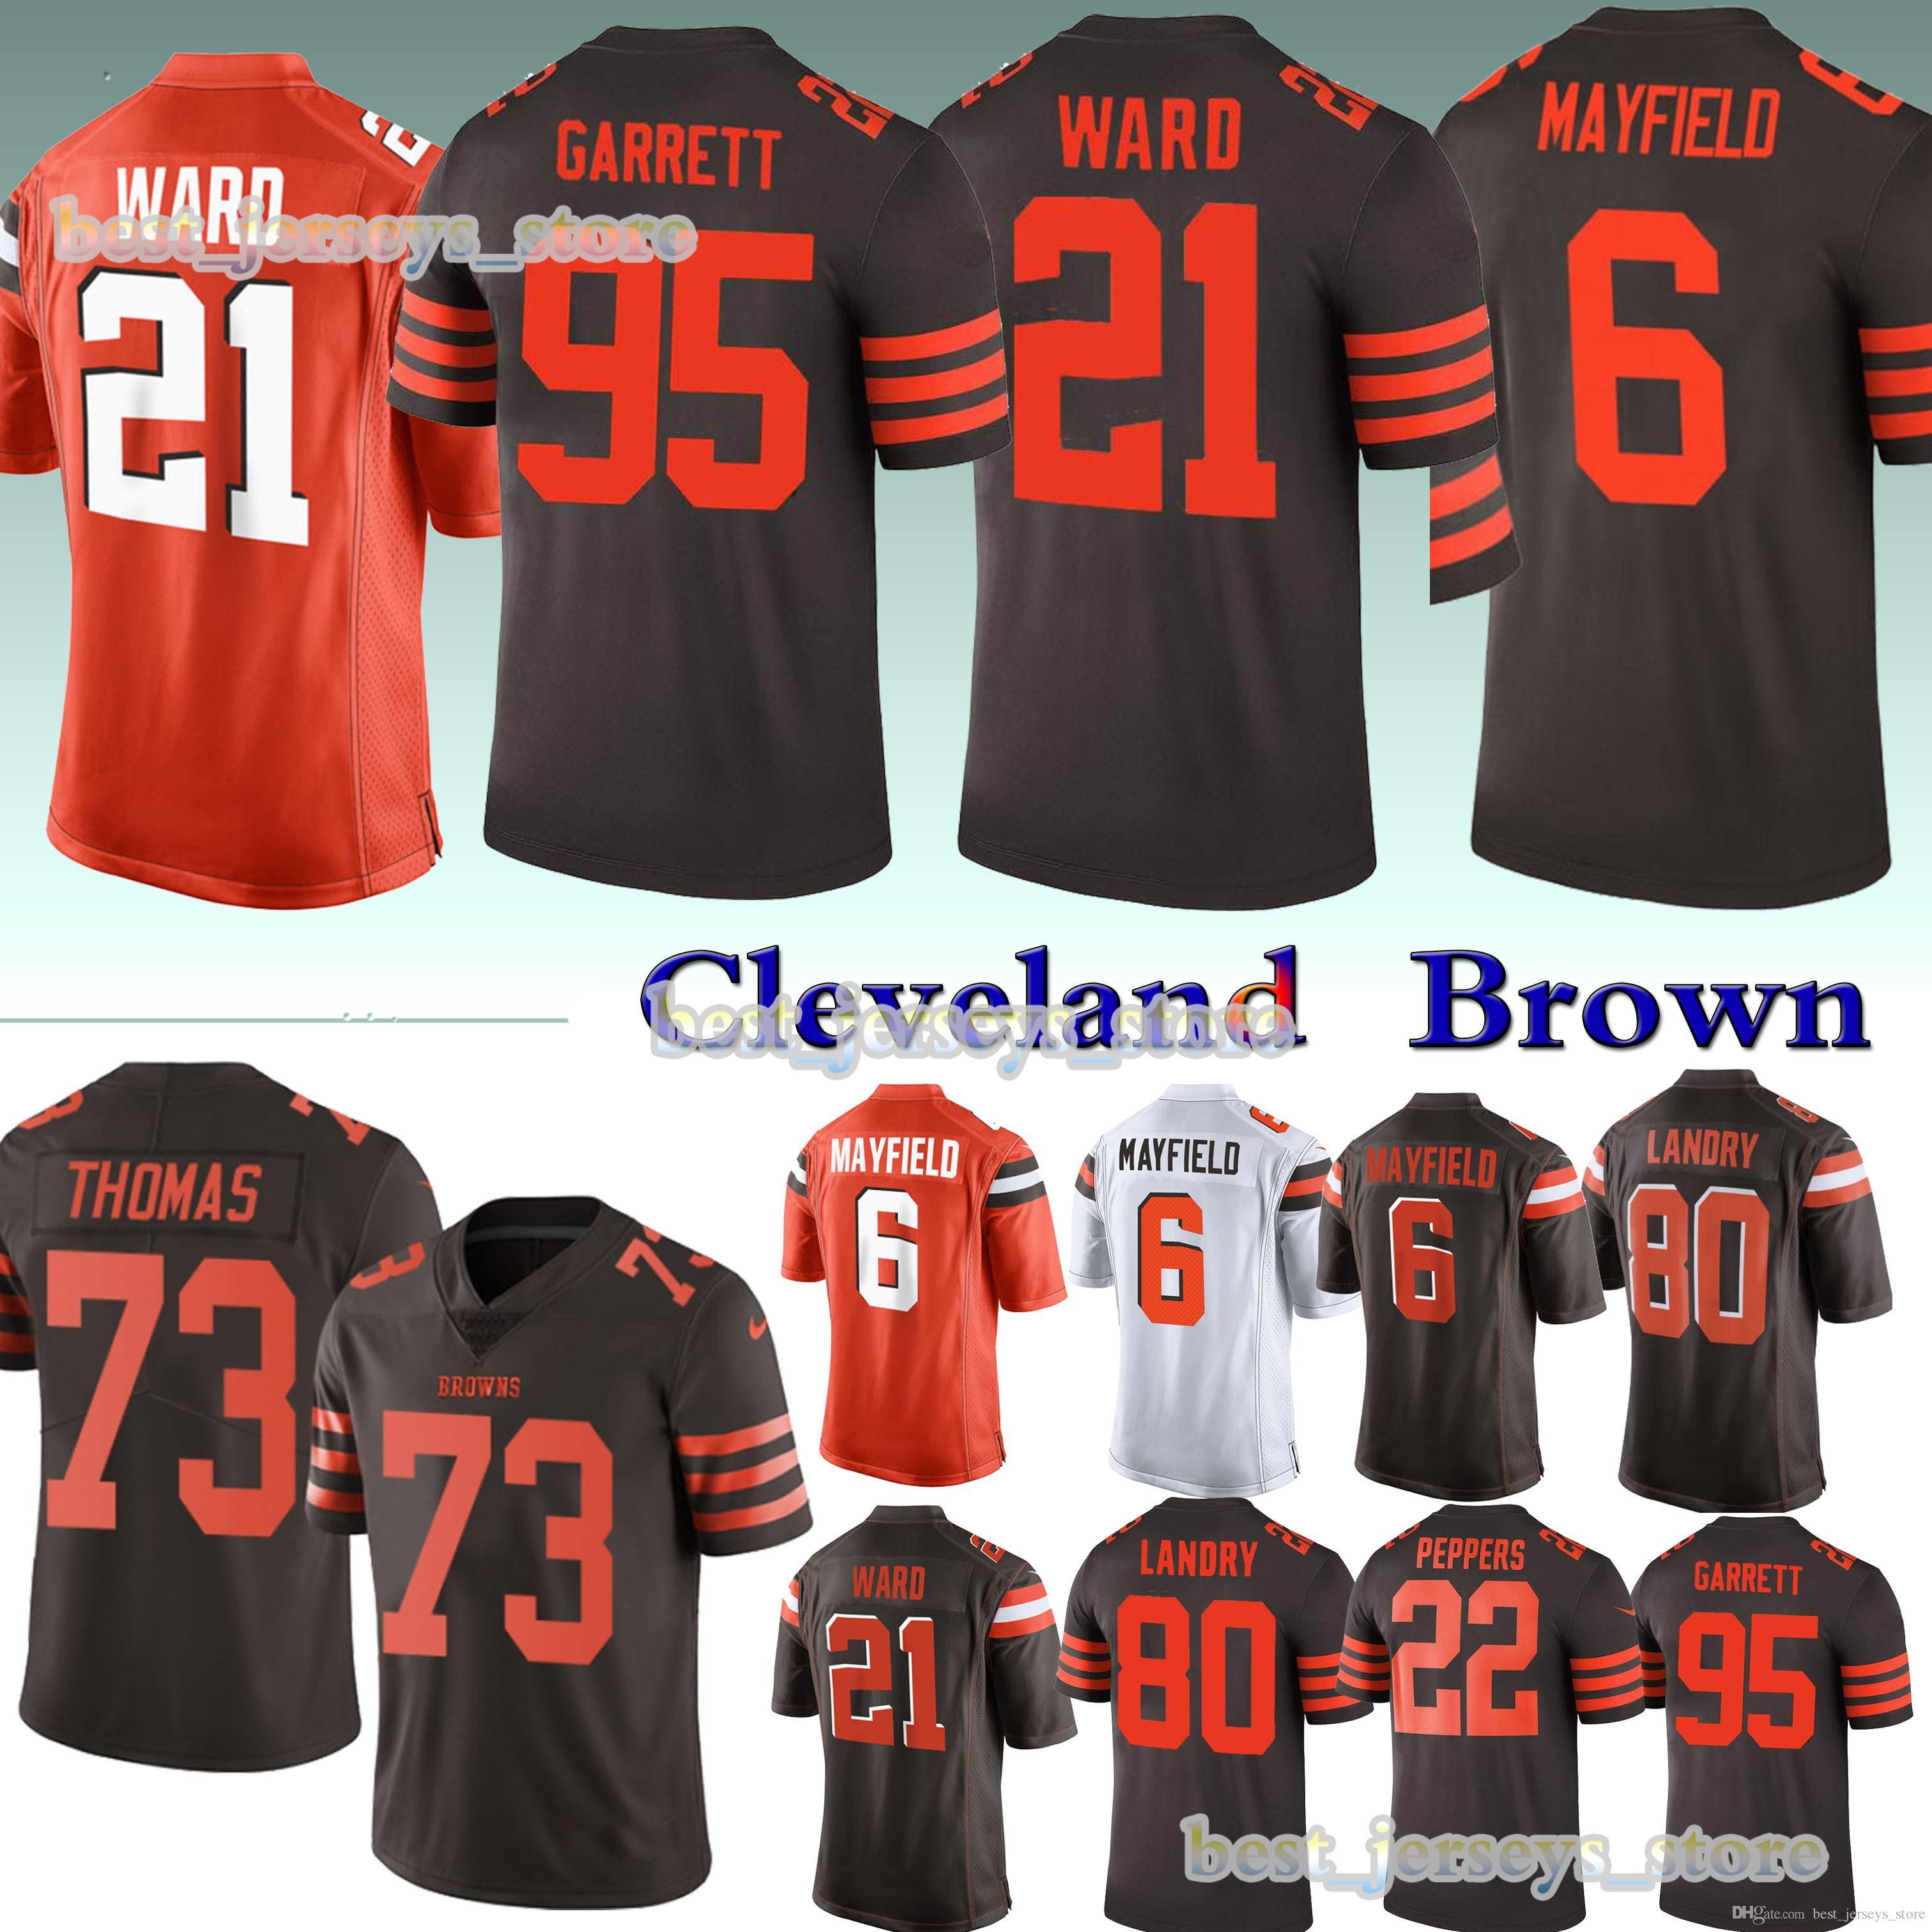 online retailer 4cd17 e3057 6 Baker Mayfield 21 Denzel Ward 13 Odell Beckham Jr Cleveland jerseys Brown  95 Myles Garrett 80 Jarvis Landry Design sweater men